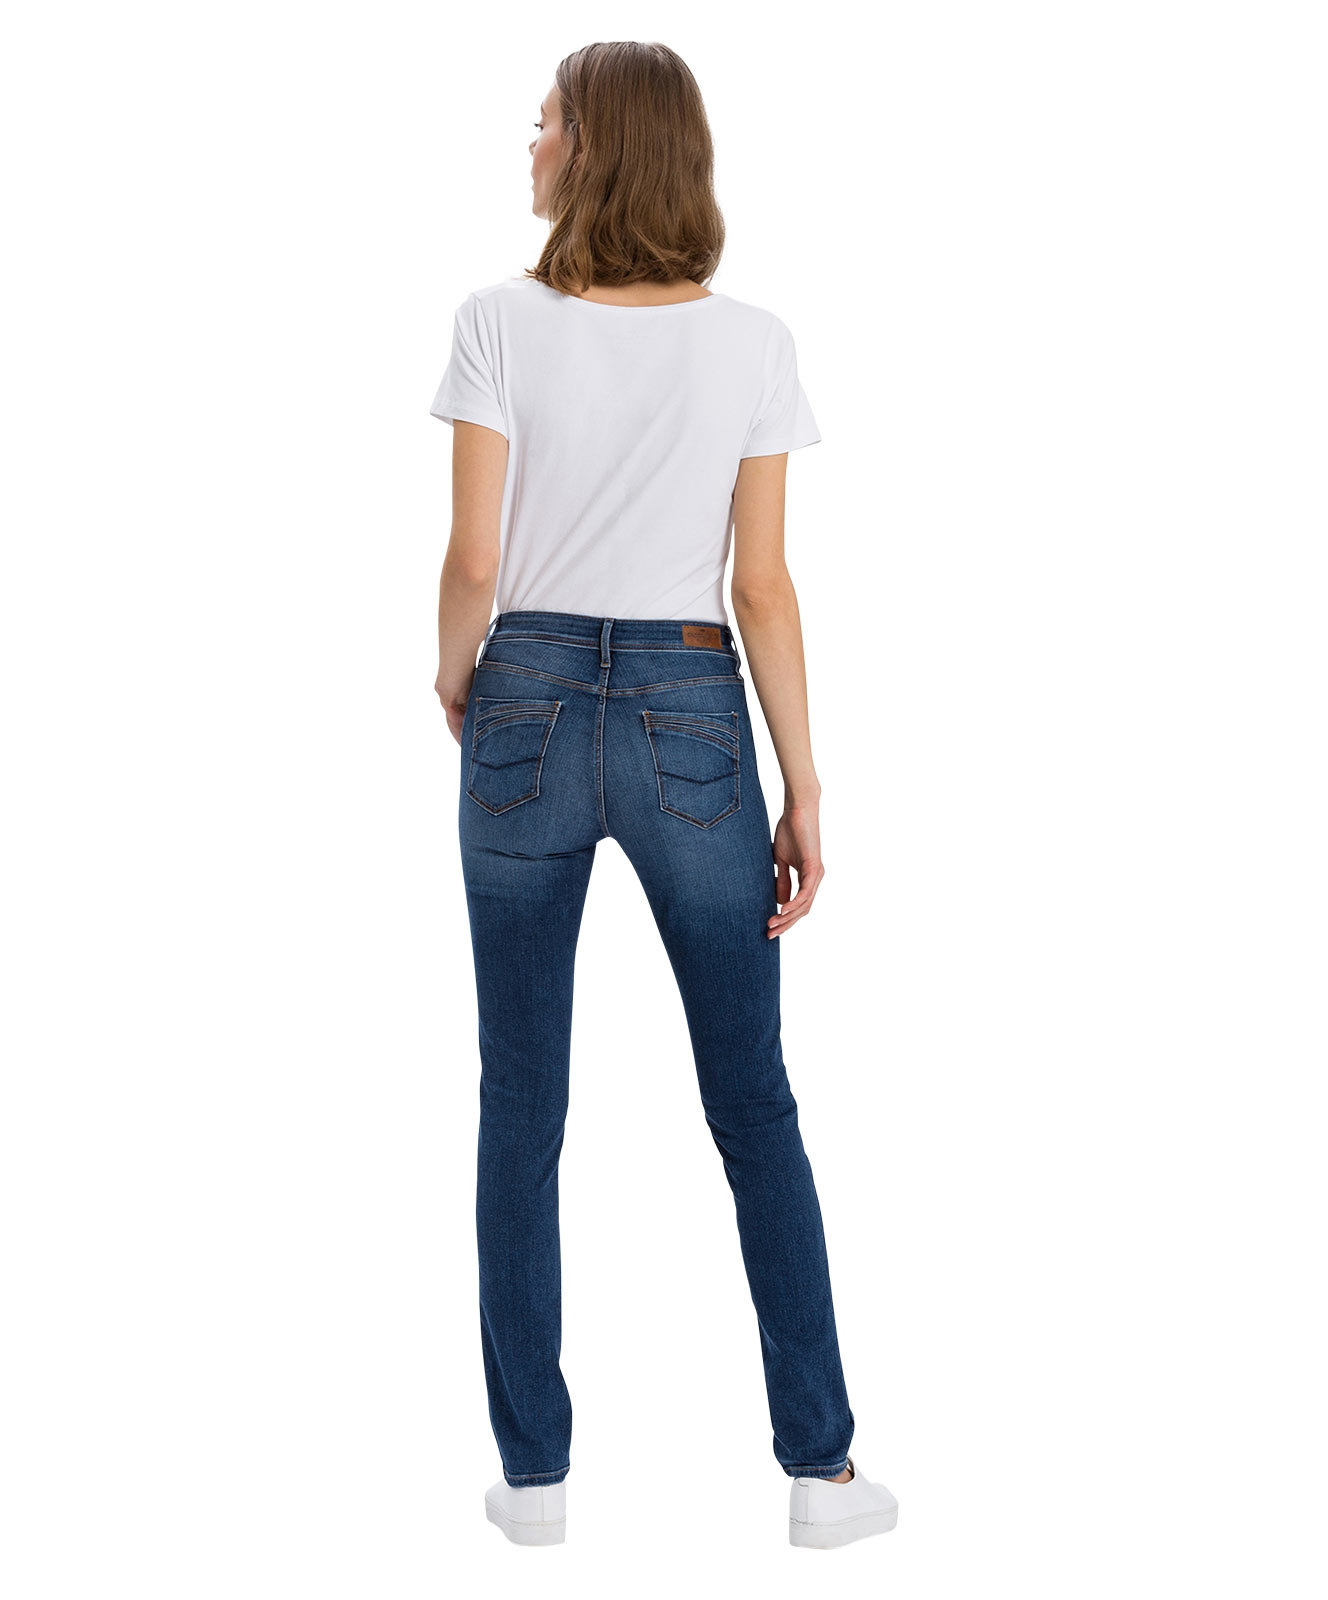 Hosen - Cross Mom Jeans Anya in Dark Mid Used  - Onlineshop Jeans Meile